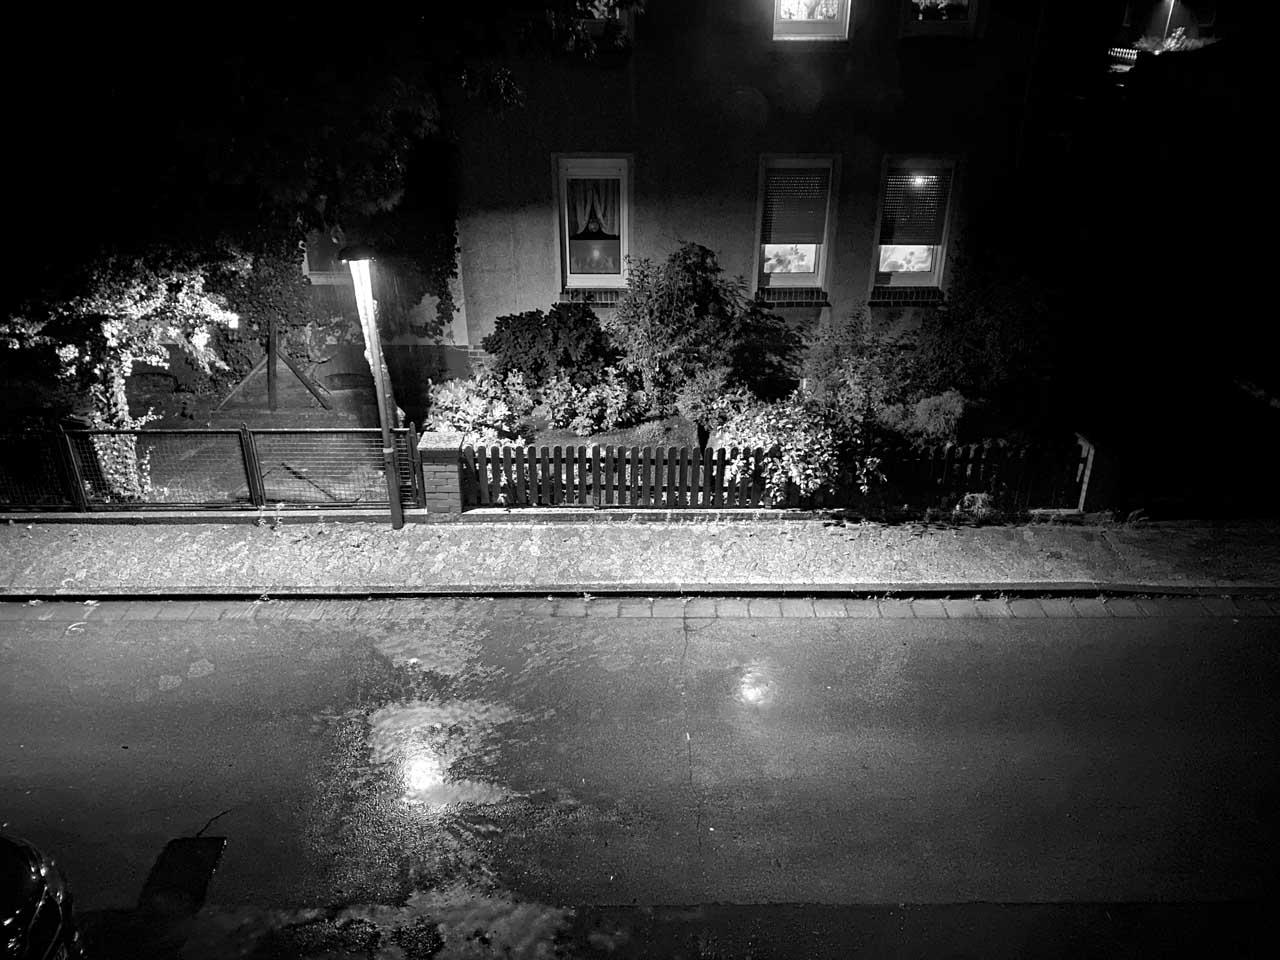 Straßenszene in schwarz weiß